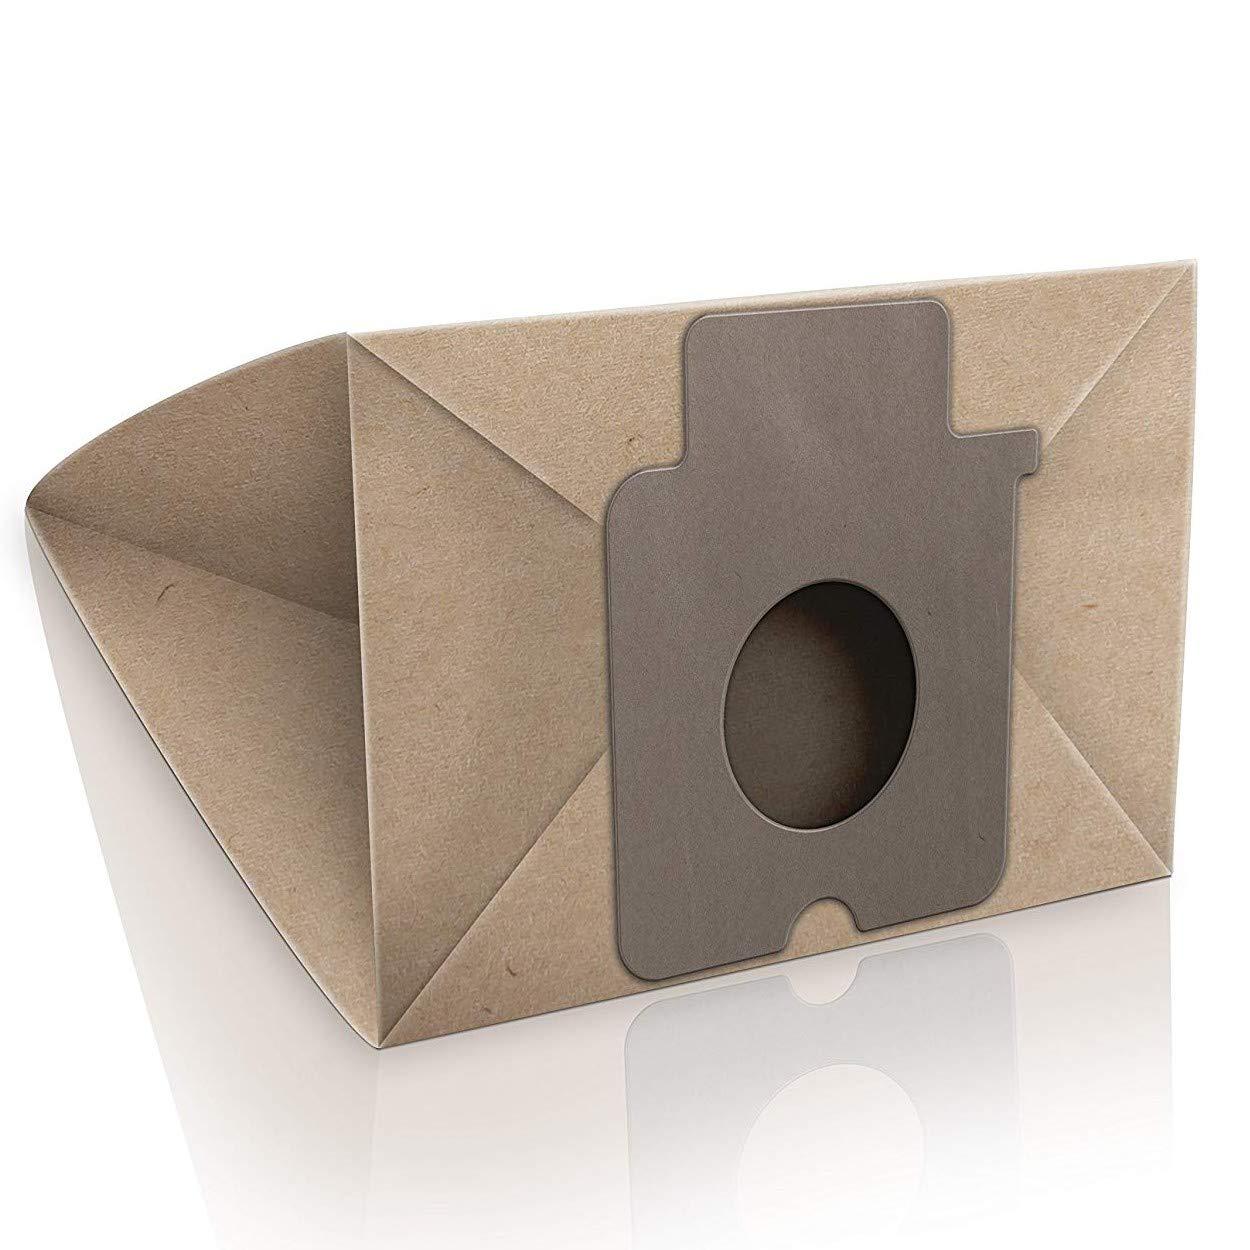 ✧WESSPER® Bolsas de aspiradora para Panasonic MC-80 (5 piezas, papel): Amazon.es: Hogar